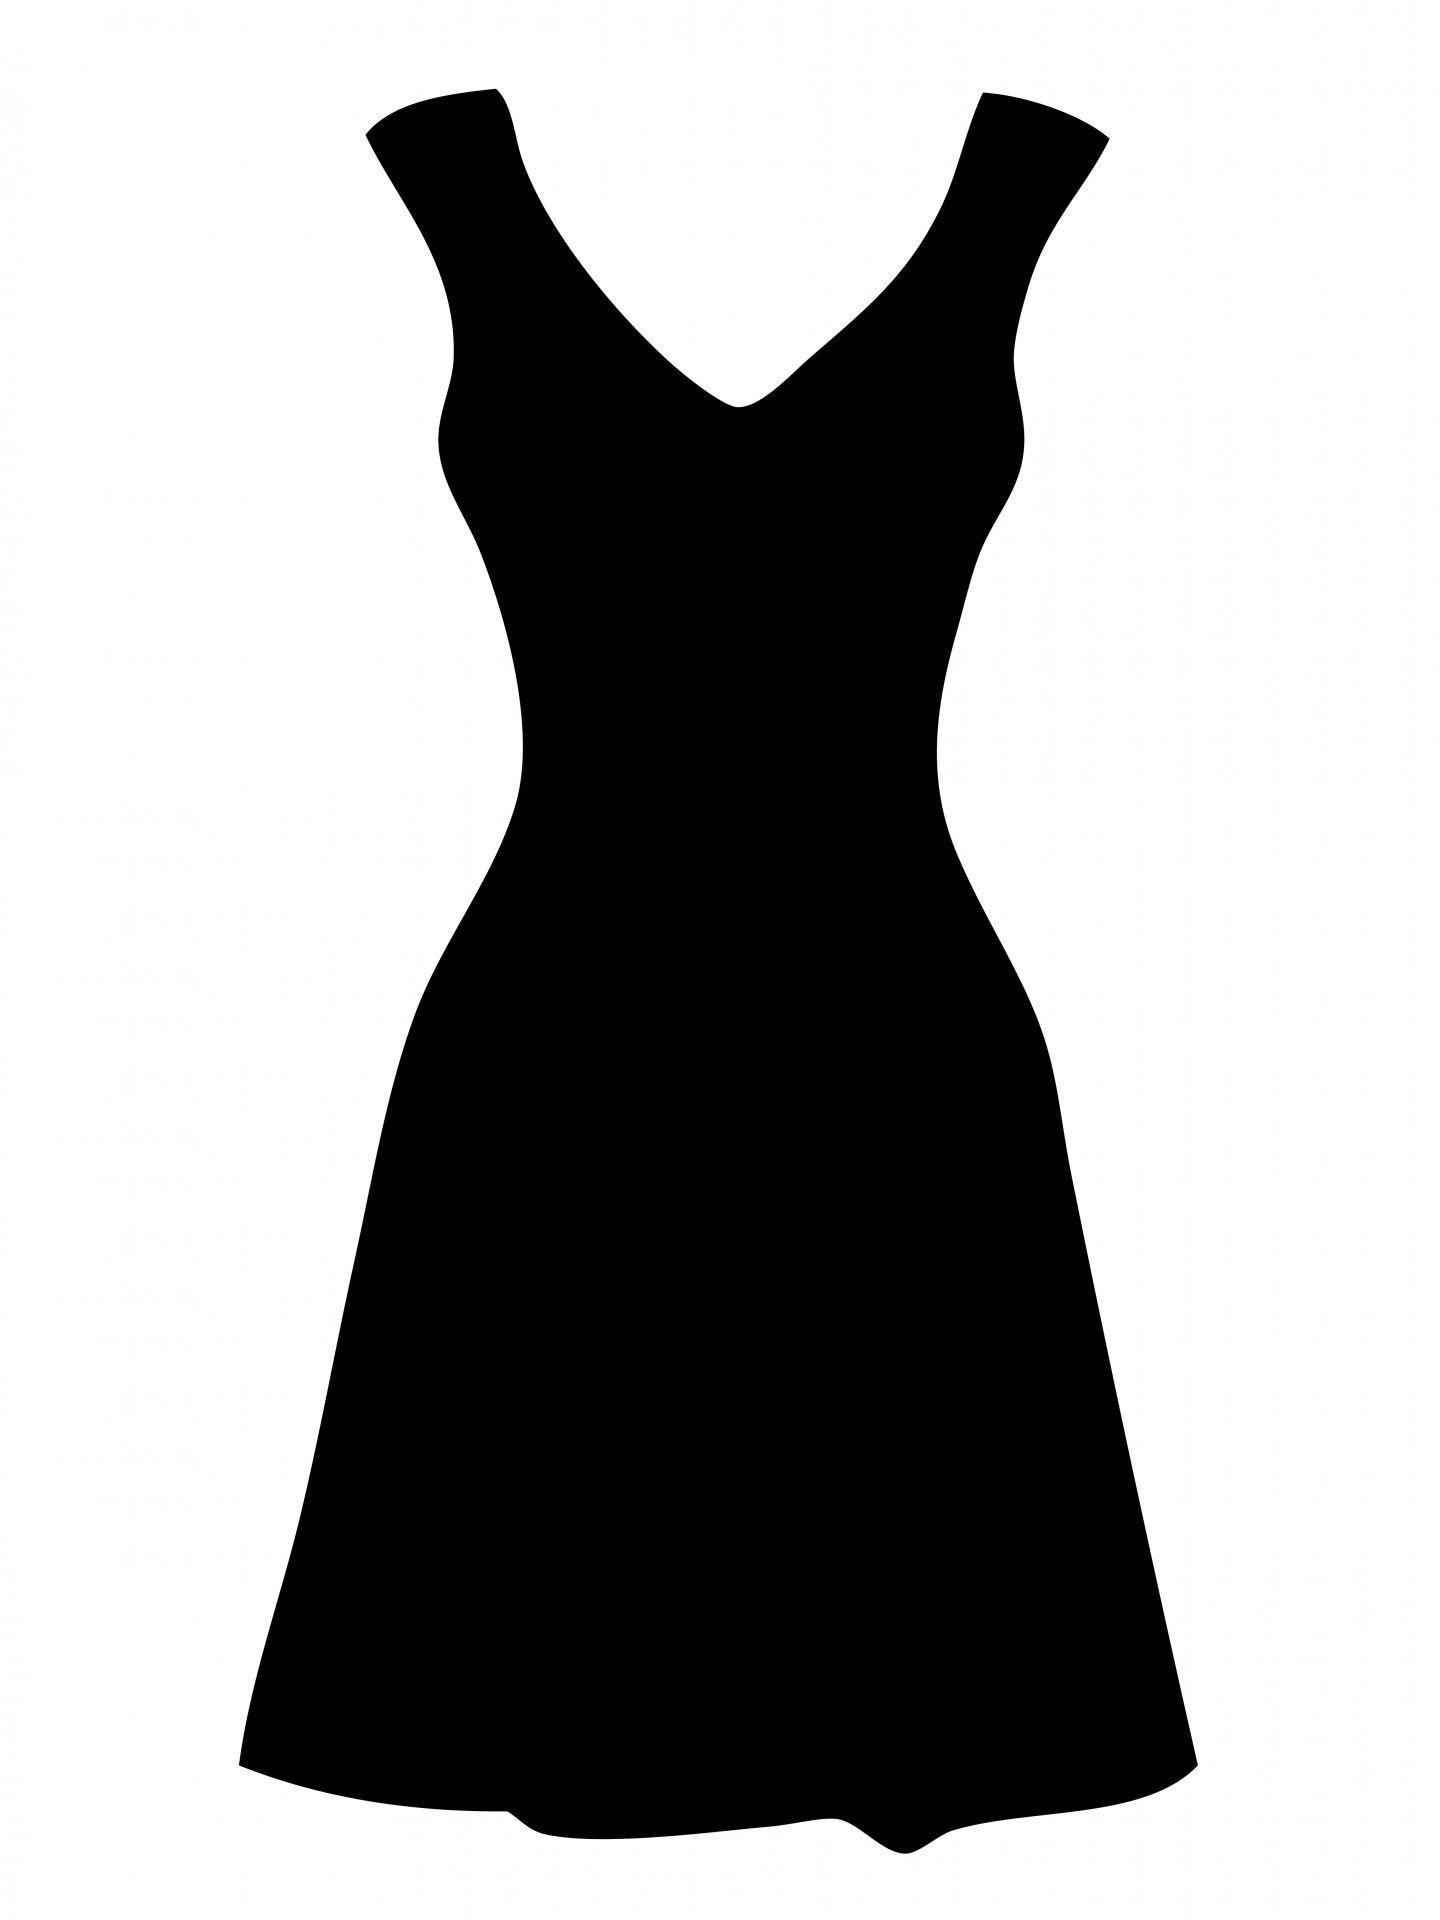 1440x1920 Free Clipart Of Dresses Black Dress Clipart By Karen Arnold